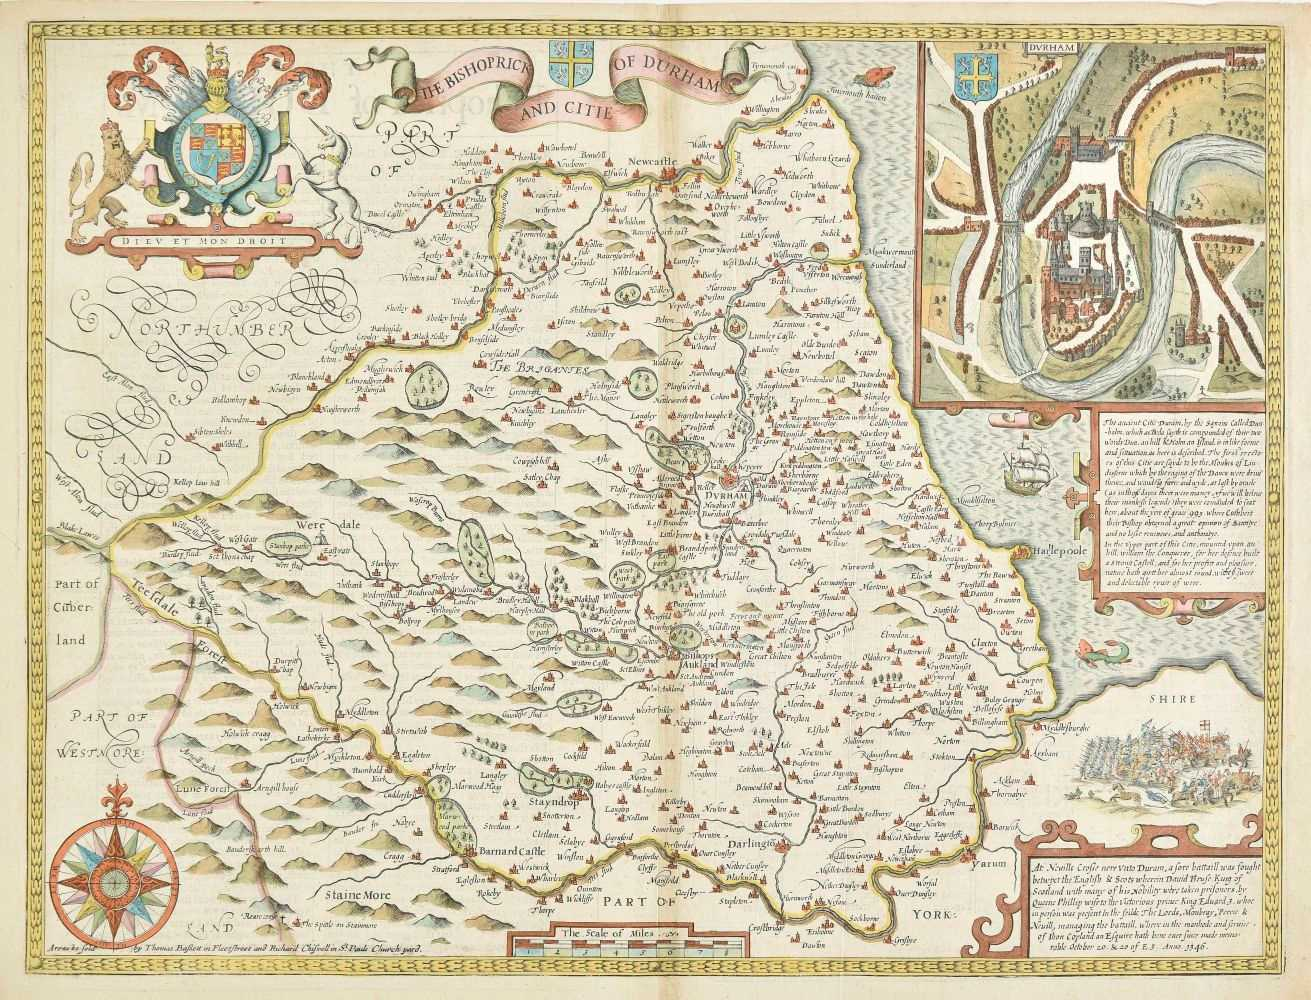 Lot 26-Durham. Speed (John), The Bishoprick and Citie of Durham, 1676